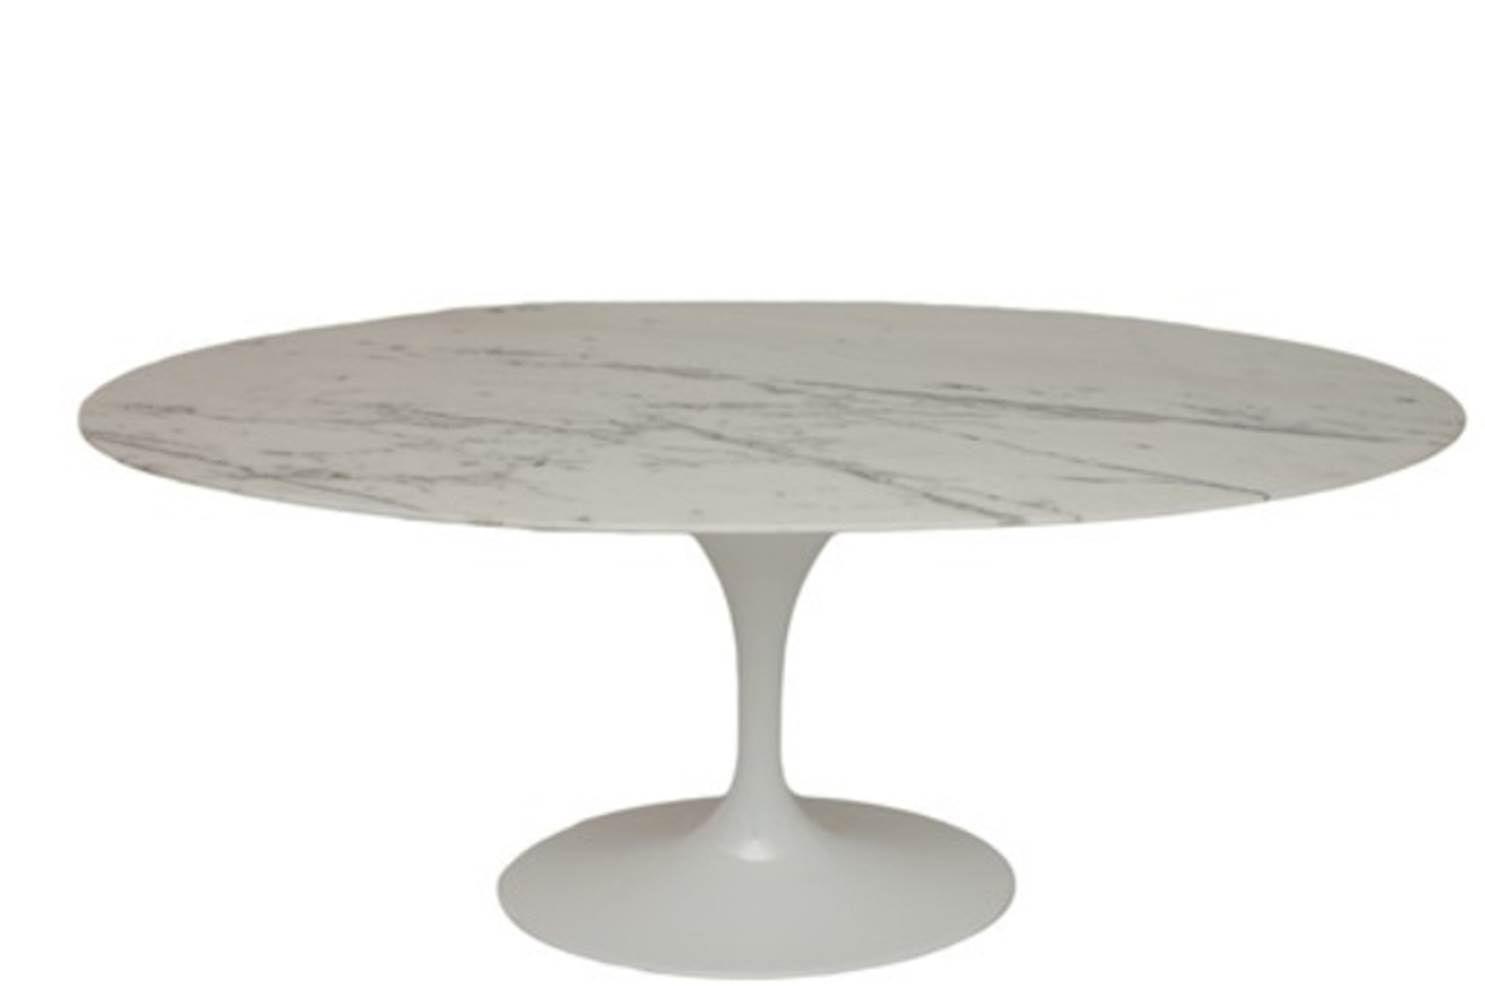 Mesa Jantar Saarinen Oval 180x100 M. Venatto Branco - 21349